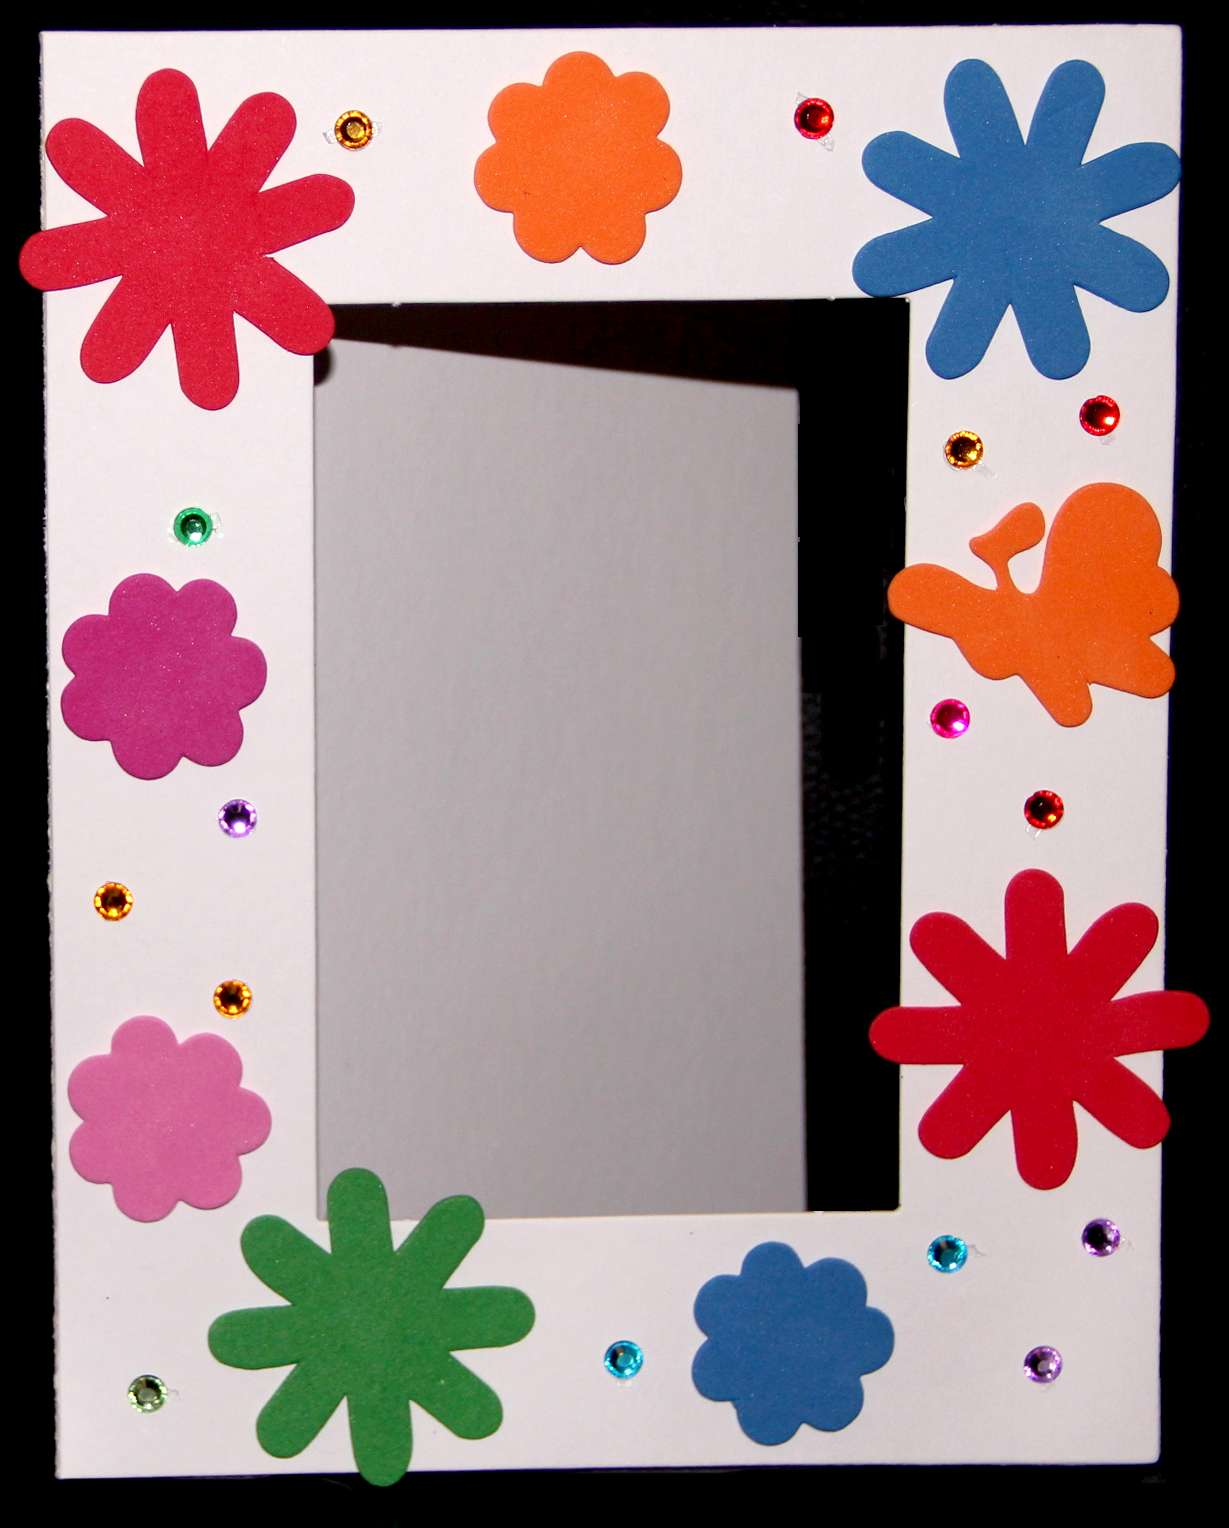 kit cadre photo avec gommettes et strass loisirs cr atifs cadres et objets d corer magommette. Black Bedroom Furniture Sets. Home Design Ideas